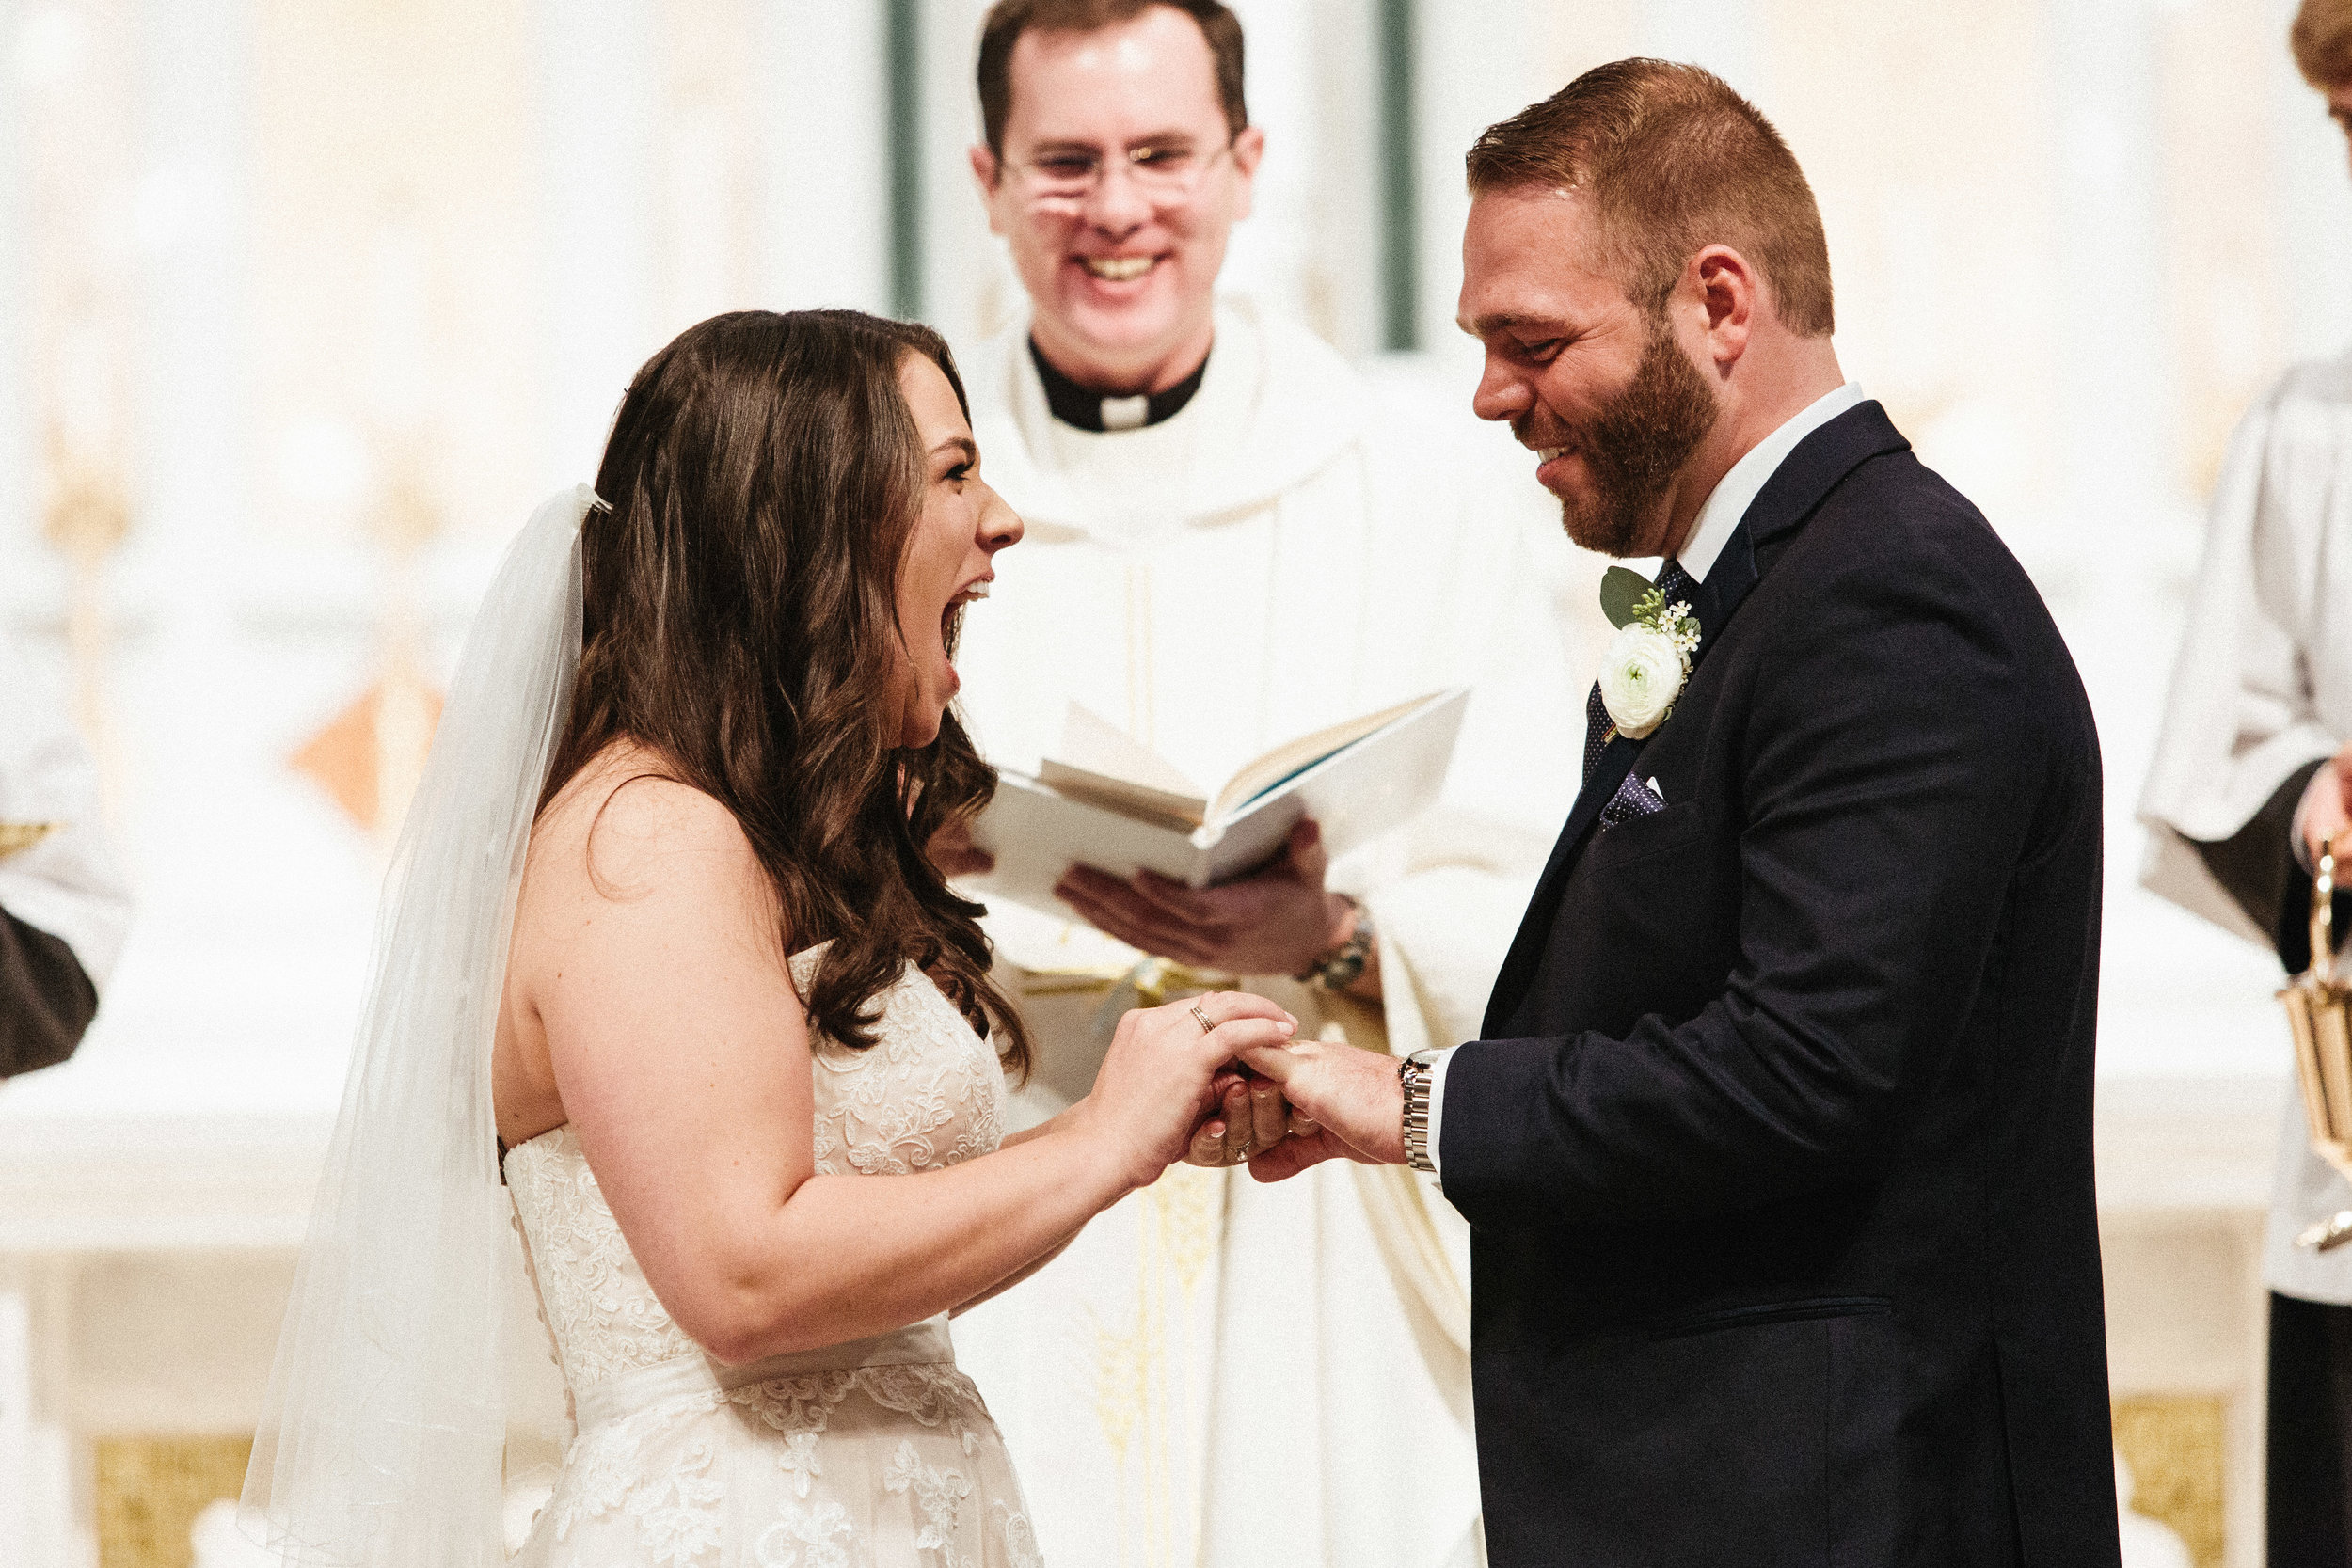 roswell_st_peter_chanel_catholic_avalon_hotel_alpharetta_wedding-1528.jpg